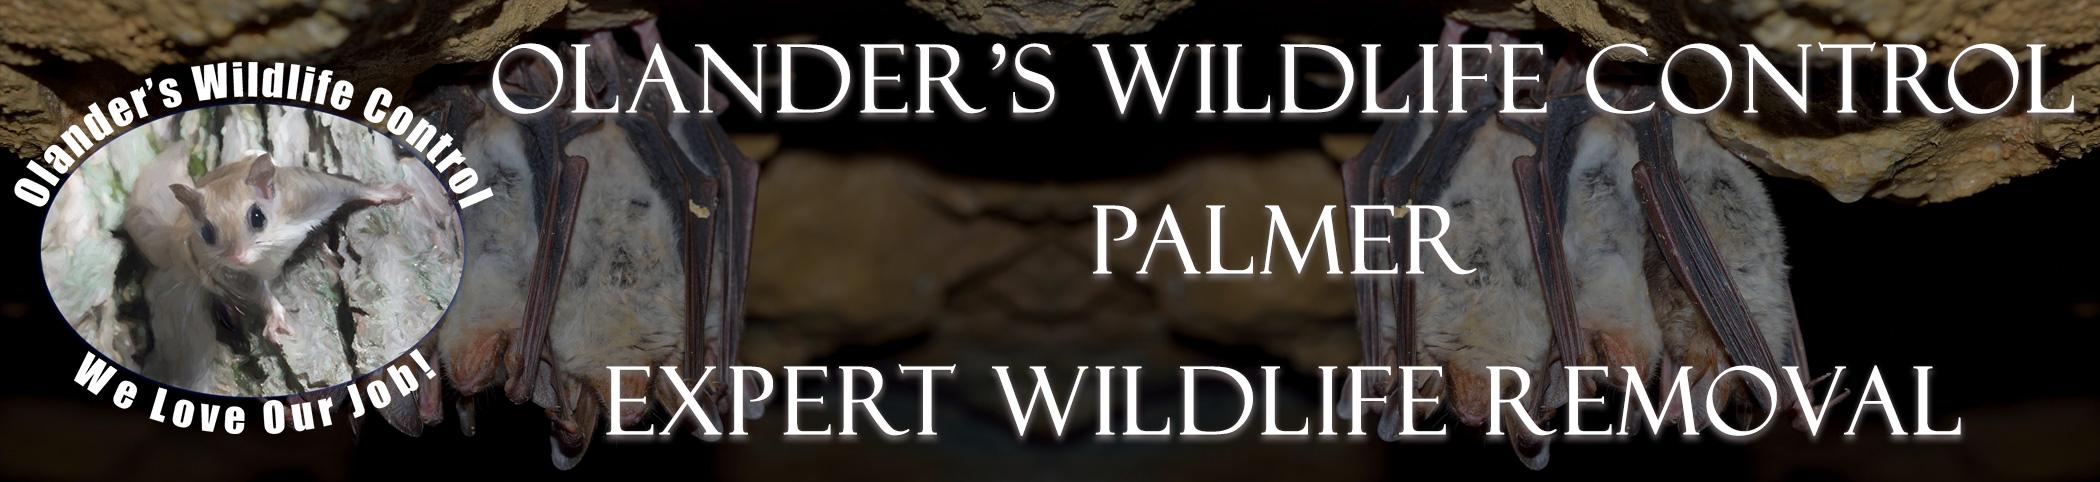 olanders-wildlife-control-palmer-mass-header-image